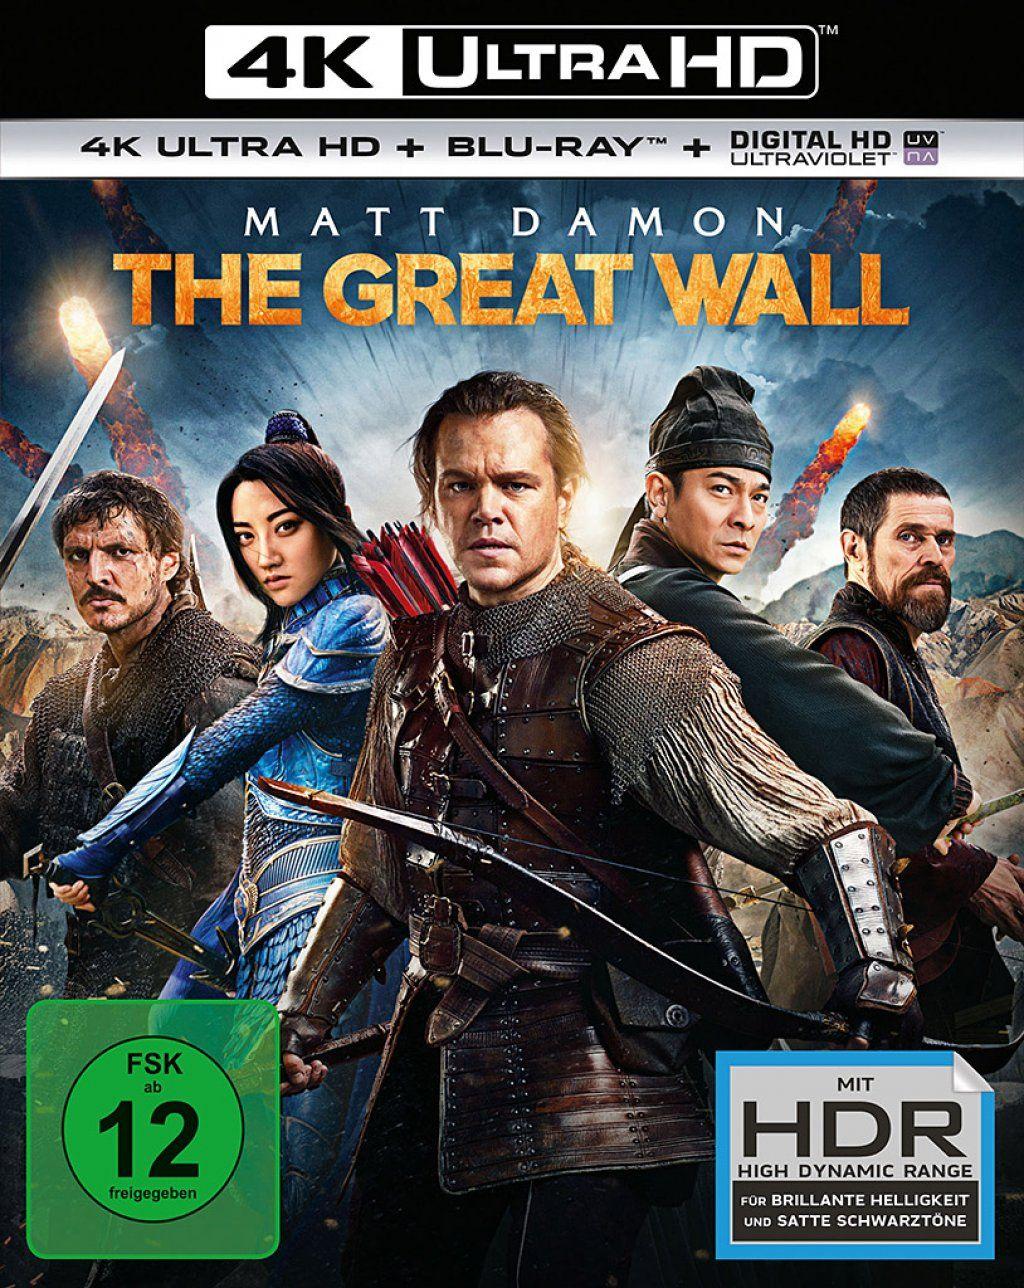 Great Wall, The (2 Discs) (UHD BLURAY + BLURAY)